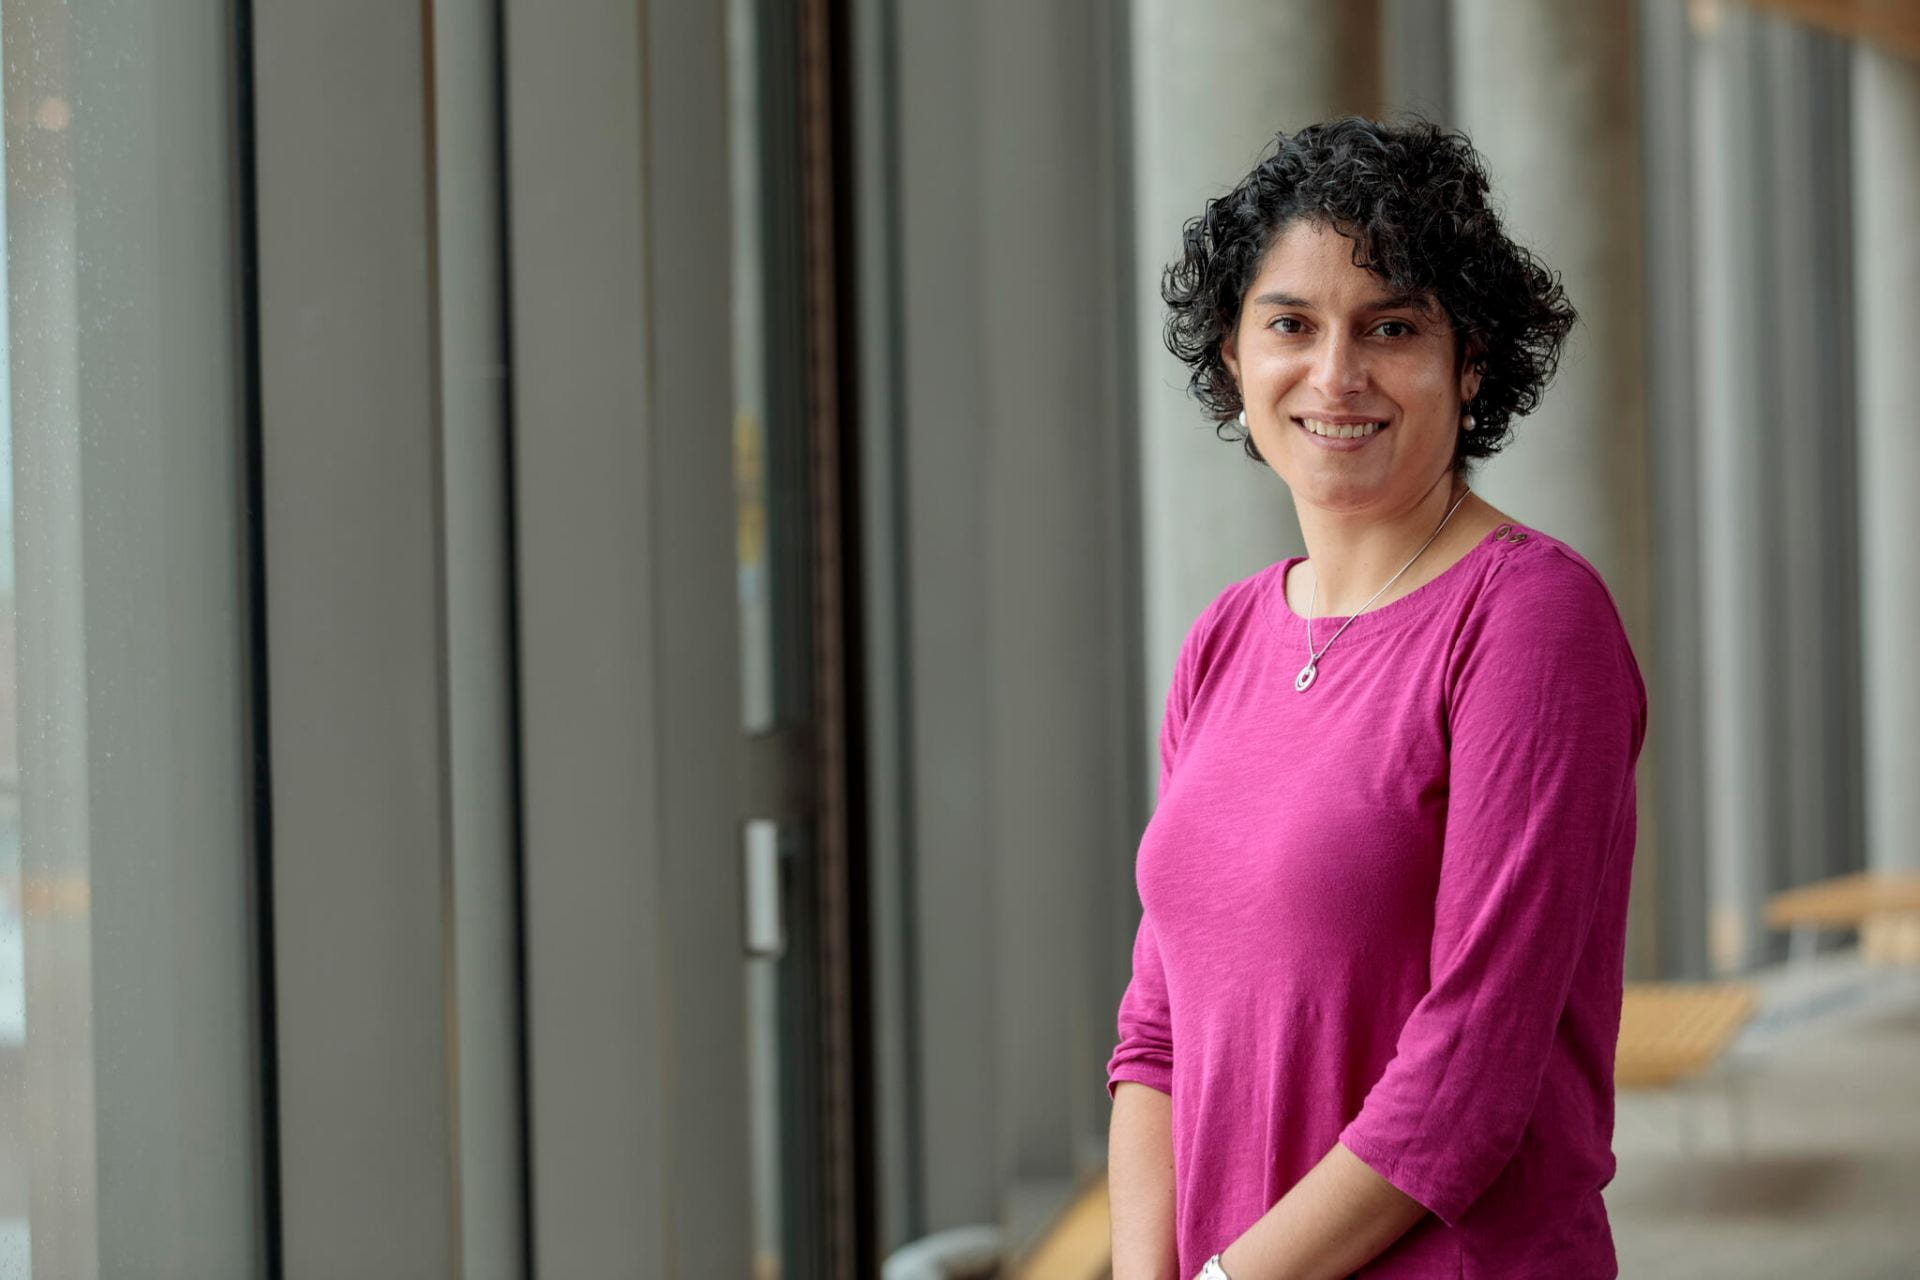 Faculty Spotlight: Deborah Salvo